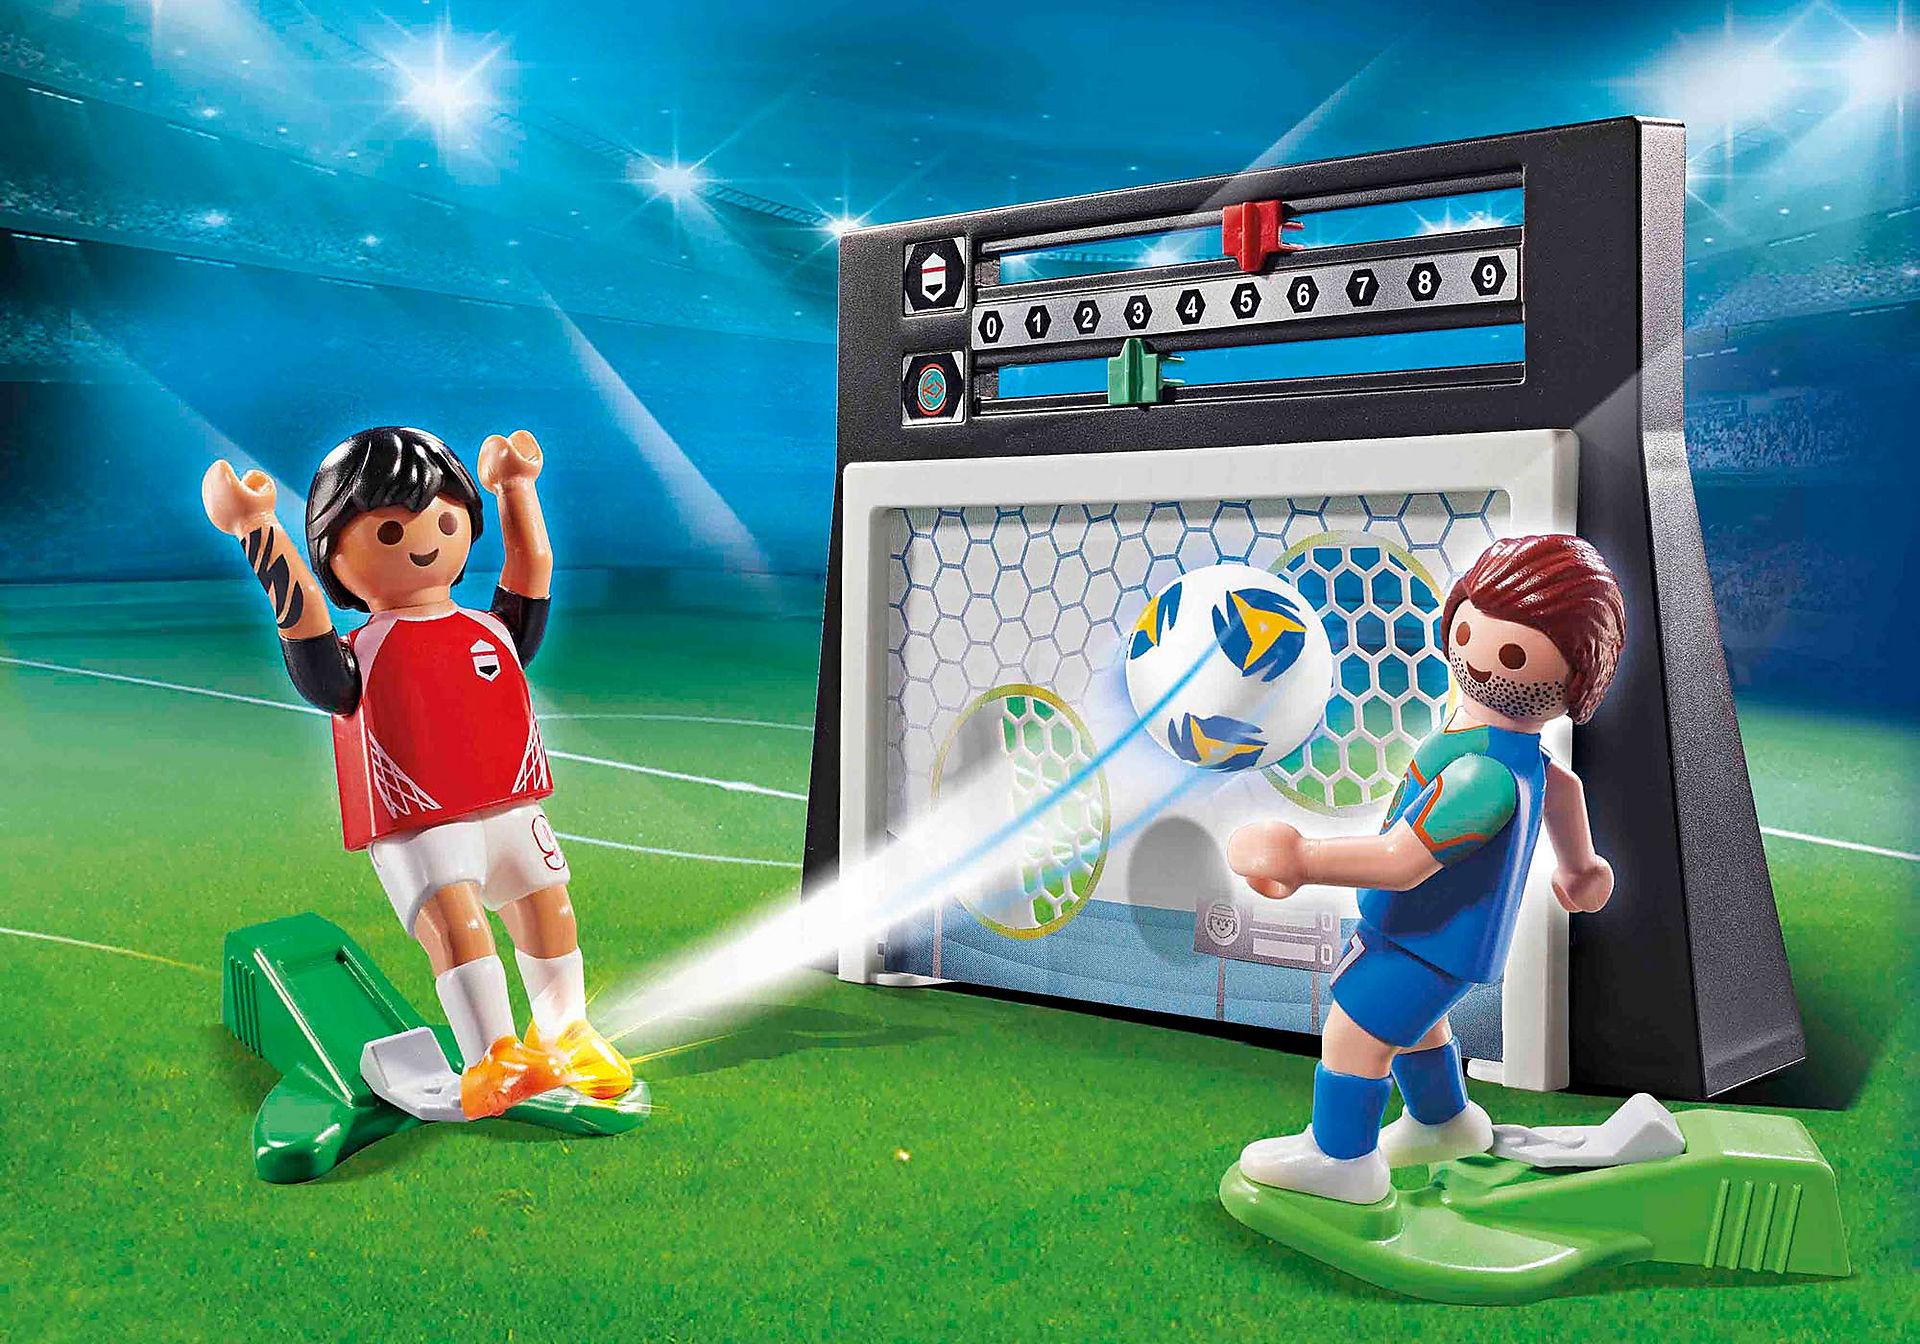 70245 Soccer Shootout Contest zoom image1